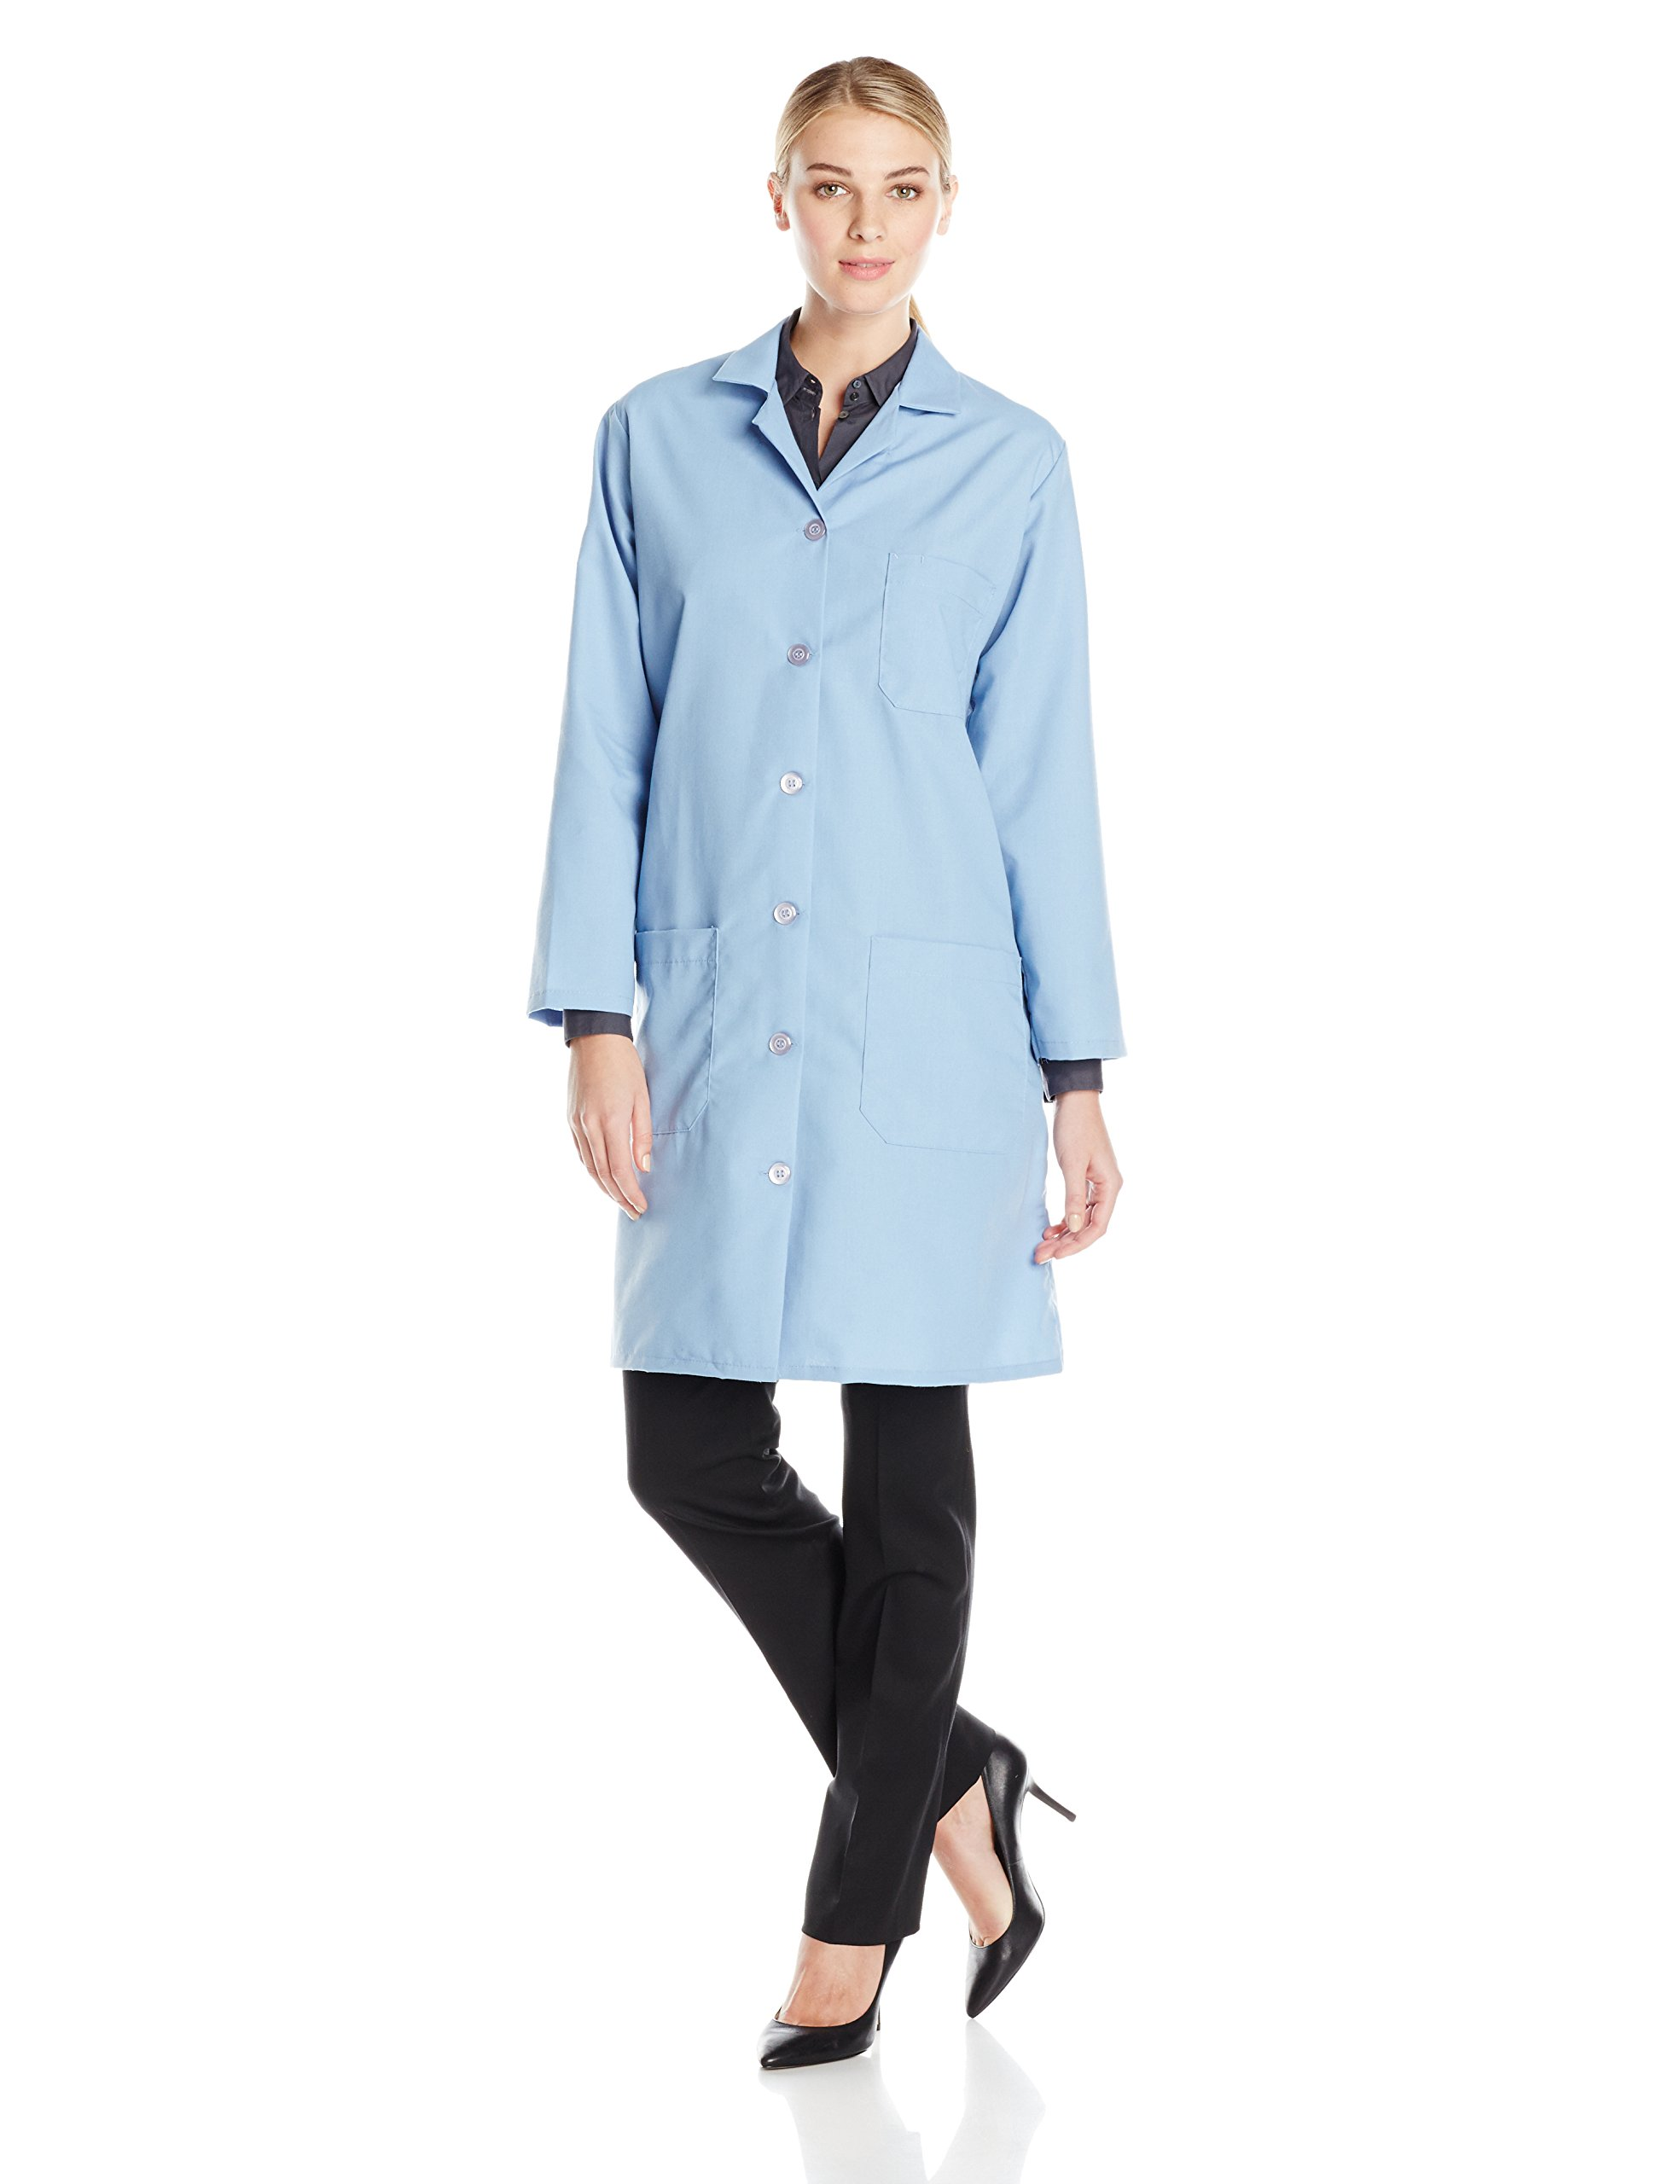 Red Kap Women's Lab Coat, Light Blue, Medium by Red Kap (Image #1)